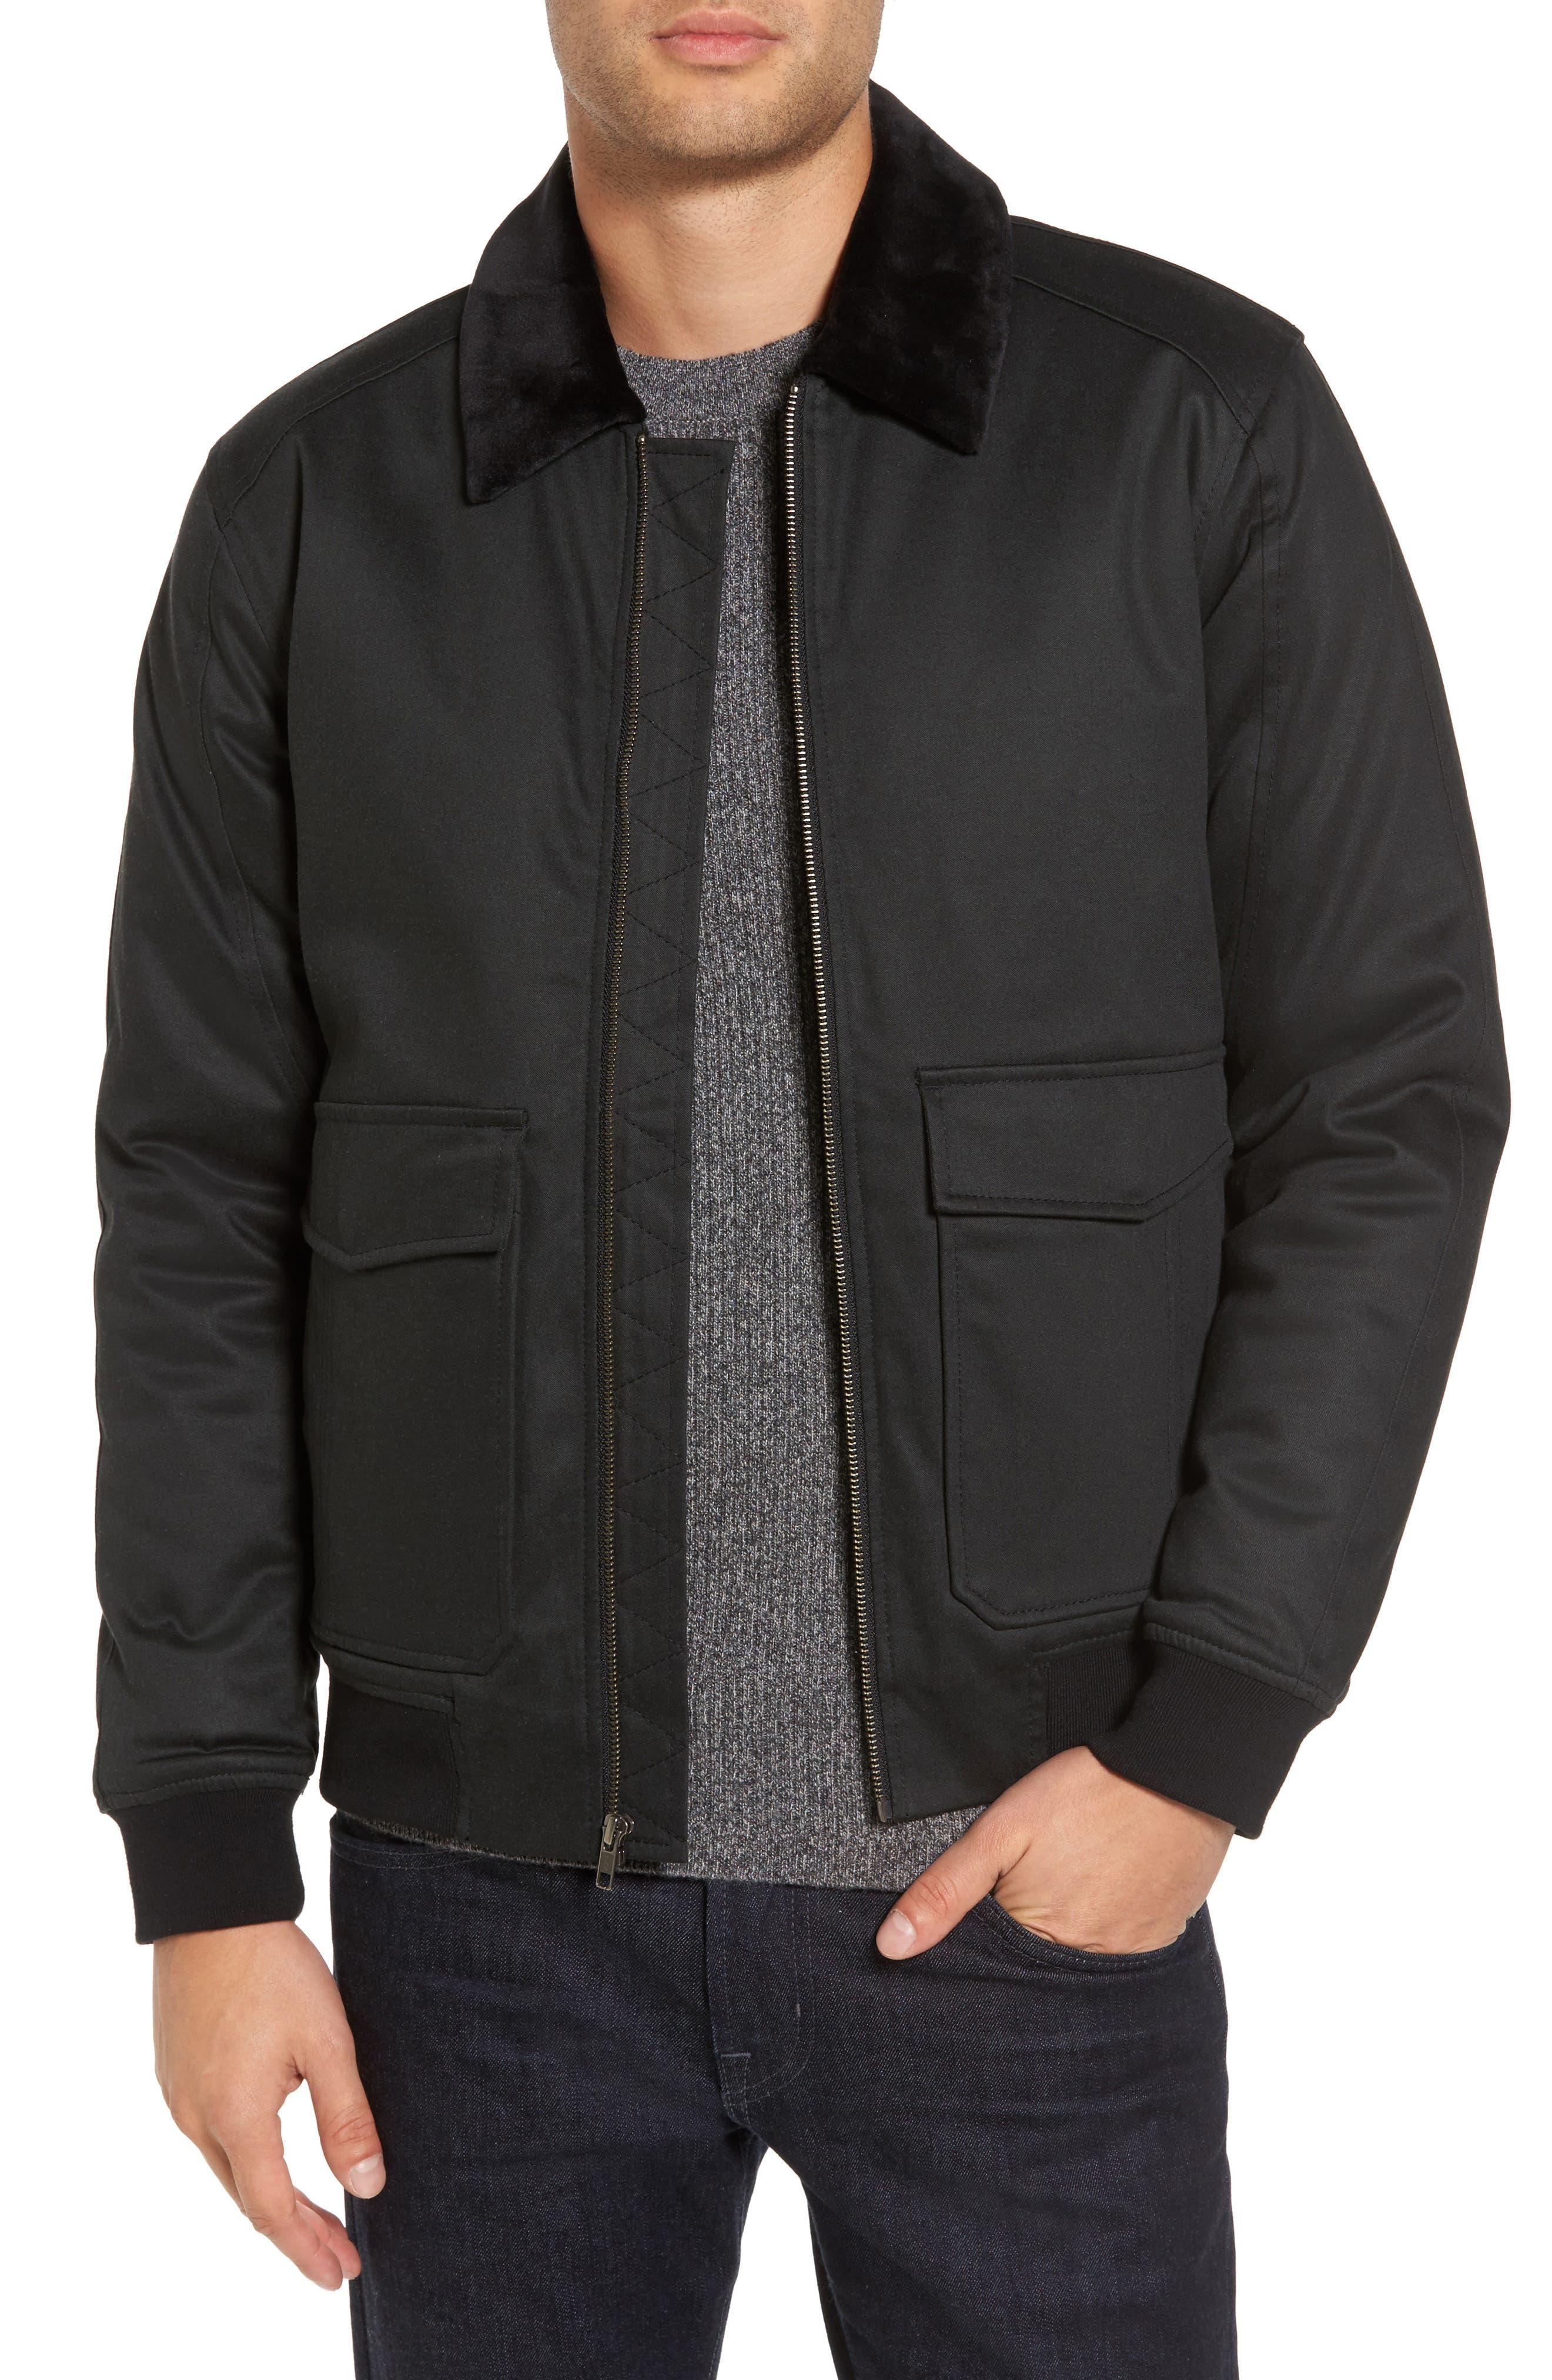 TWENTYMETRICTONS Trim Fit Zip-Up Jacket